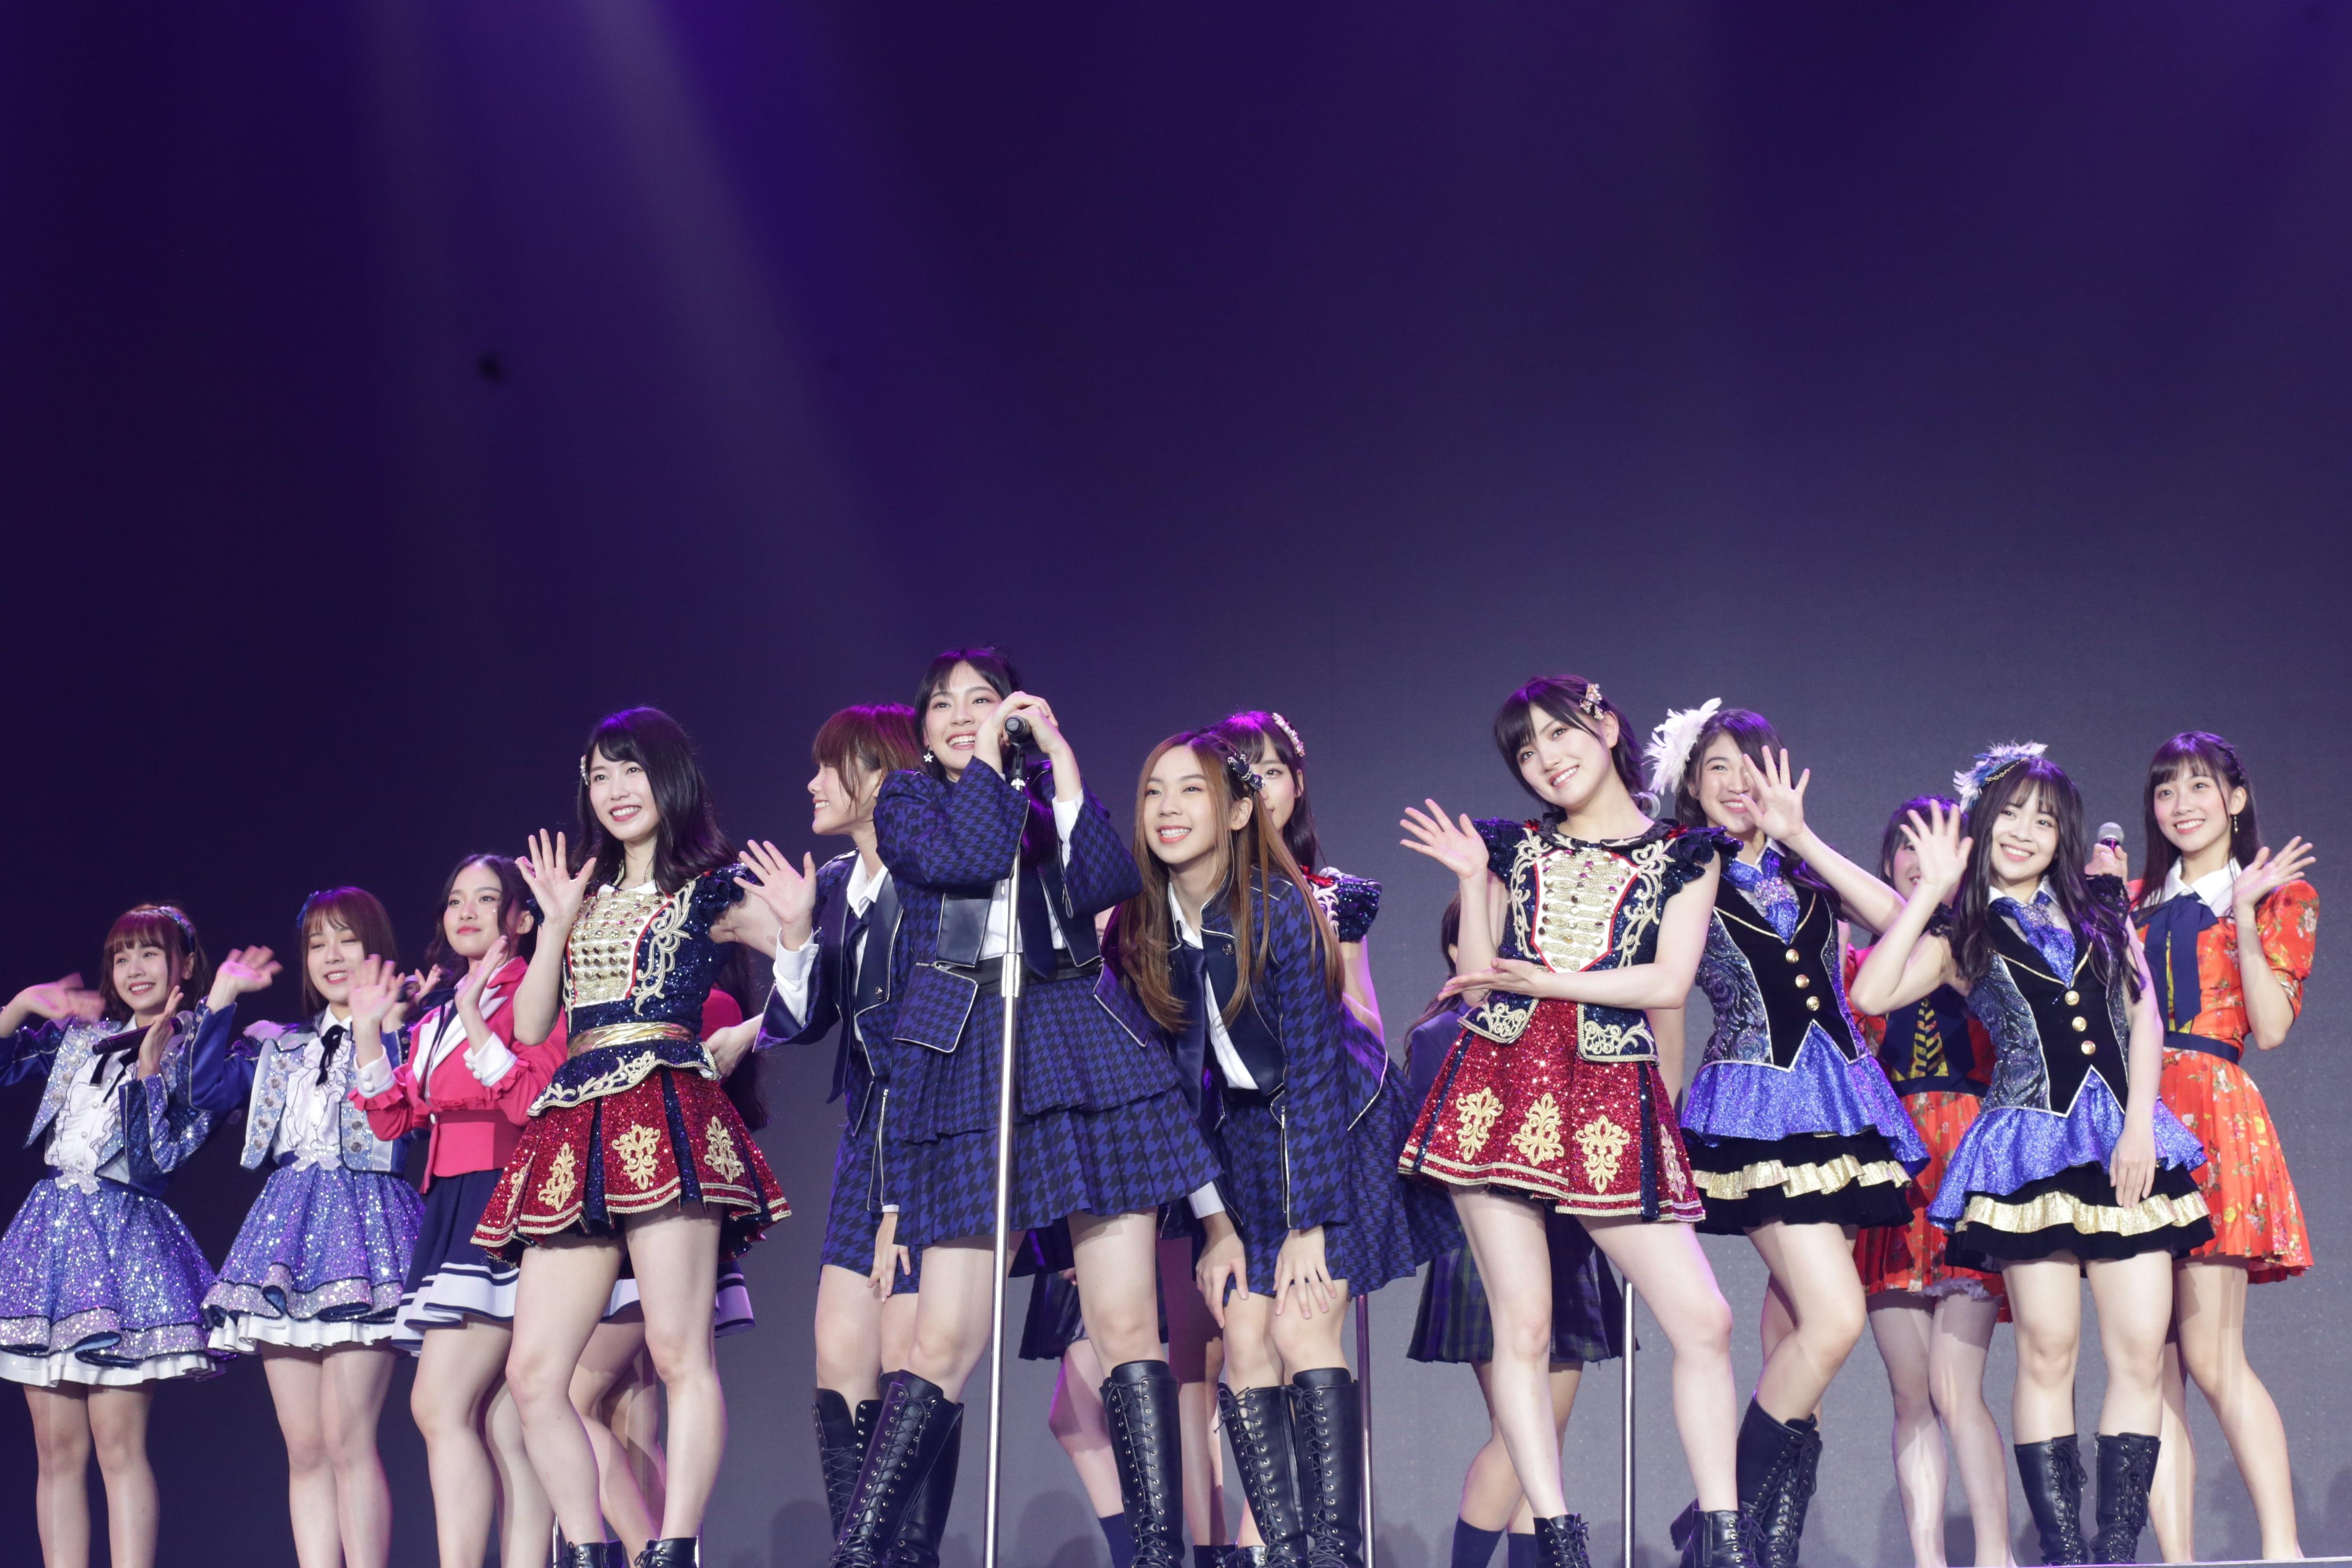 AKB48ほか、海外の姉妹グループが集結し『恋するフォーチュンクッキー』を熱唱!【写真23枚】の画像011